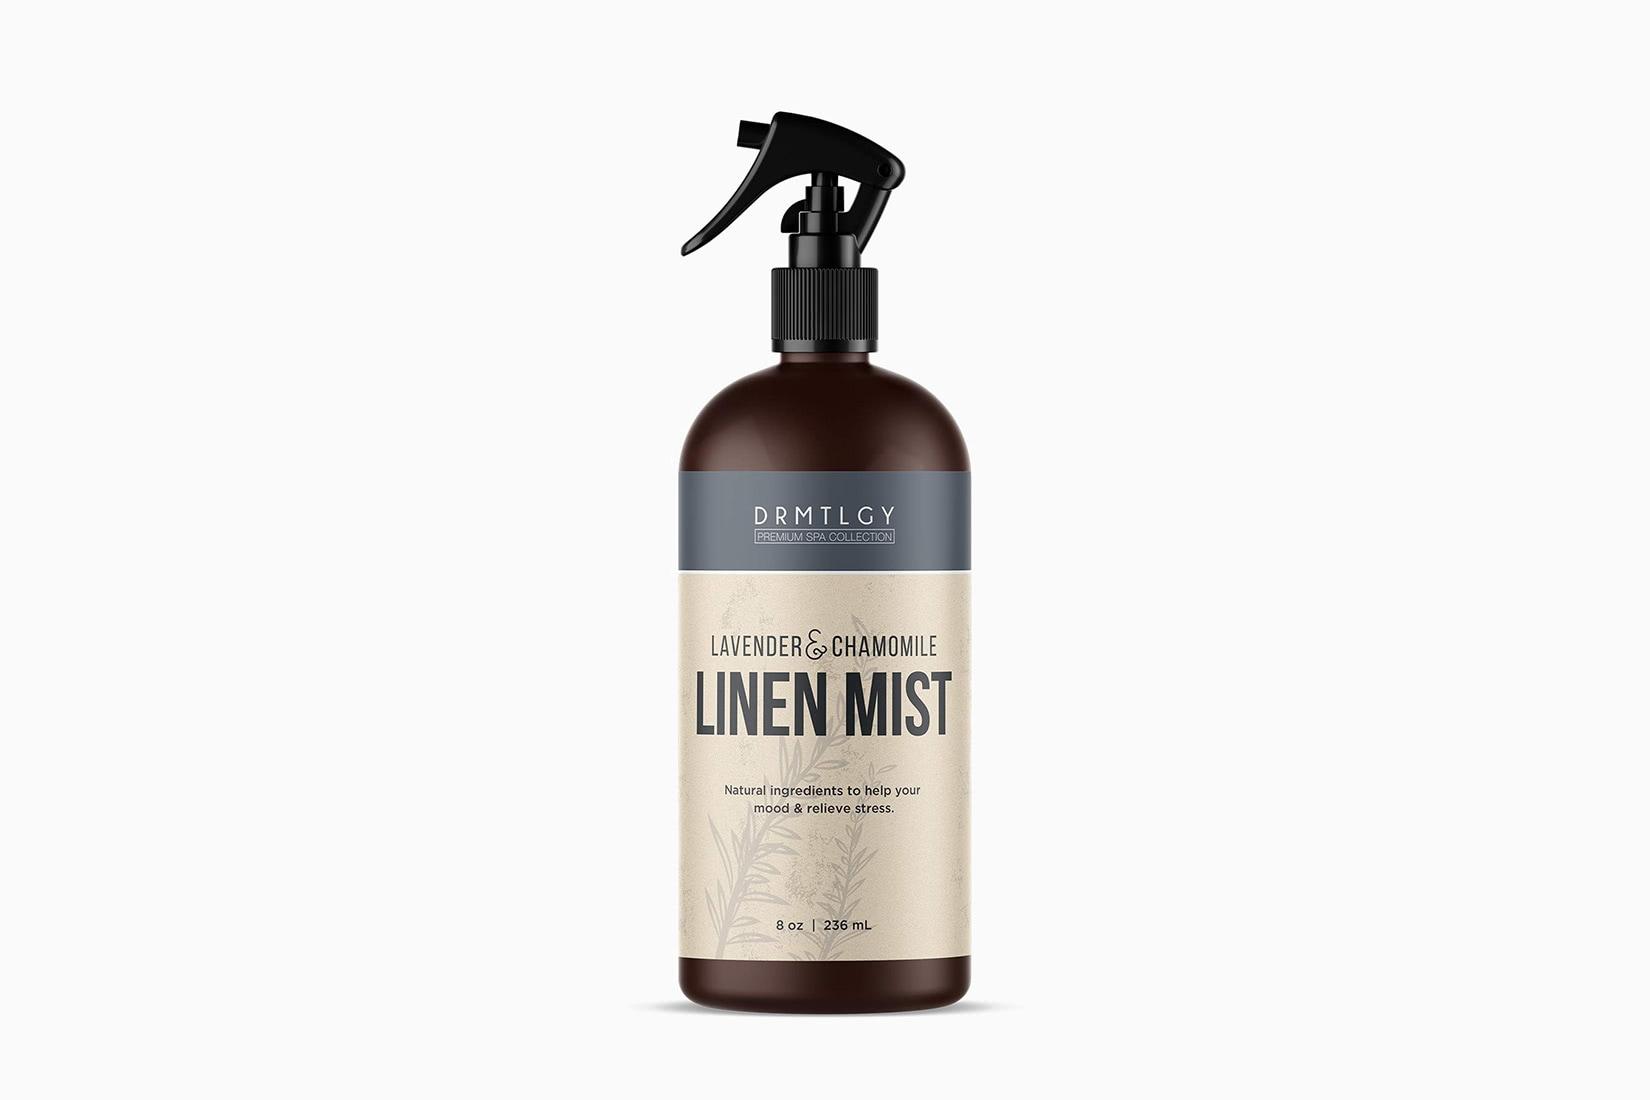 best spray DMTLGY linen mist home fragrance - Luxe Digital